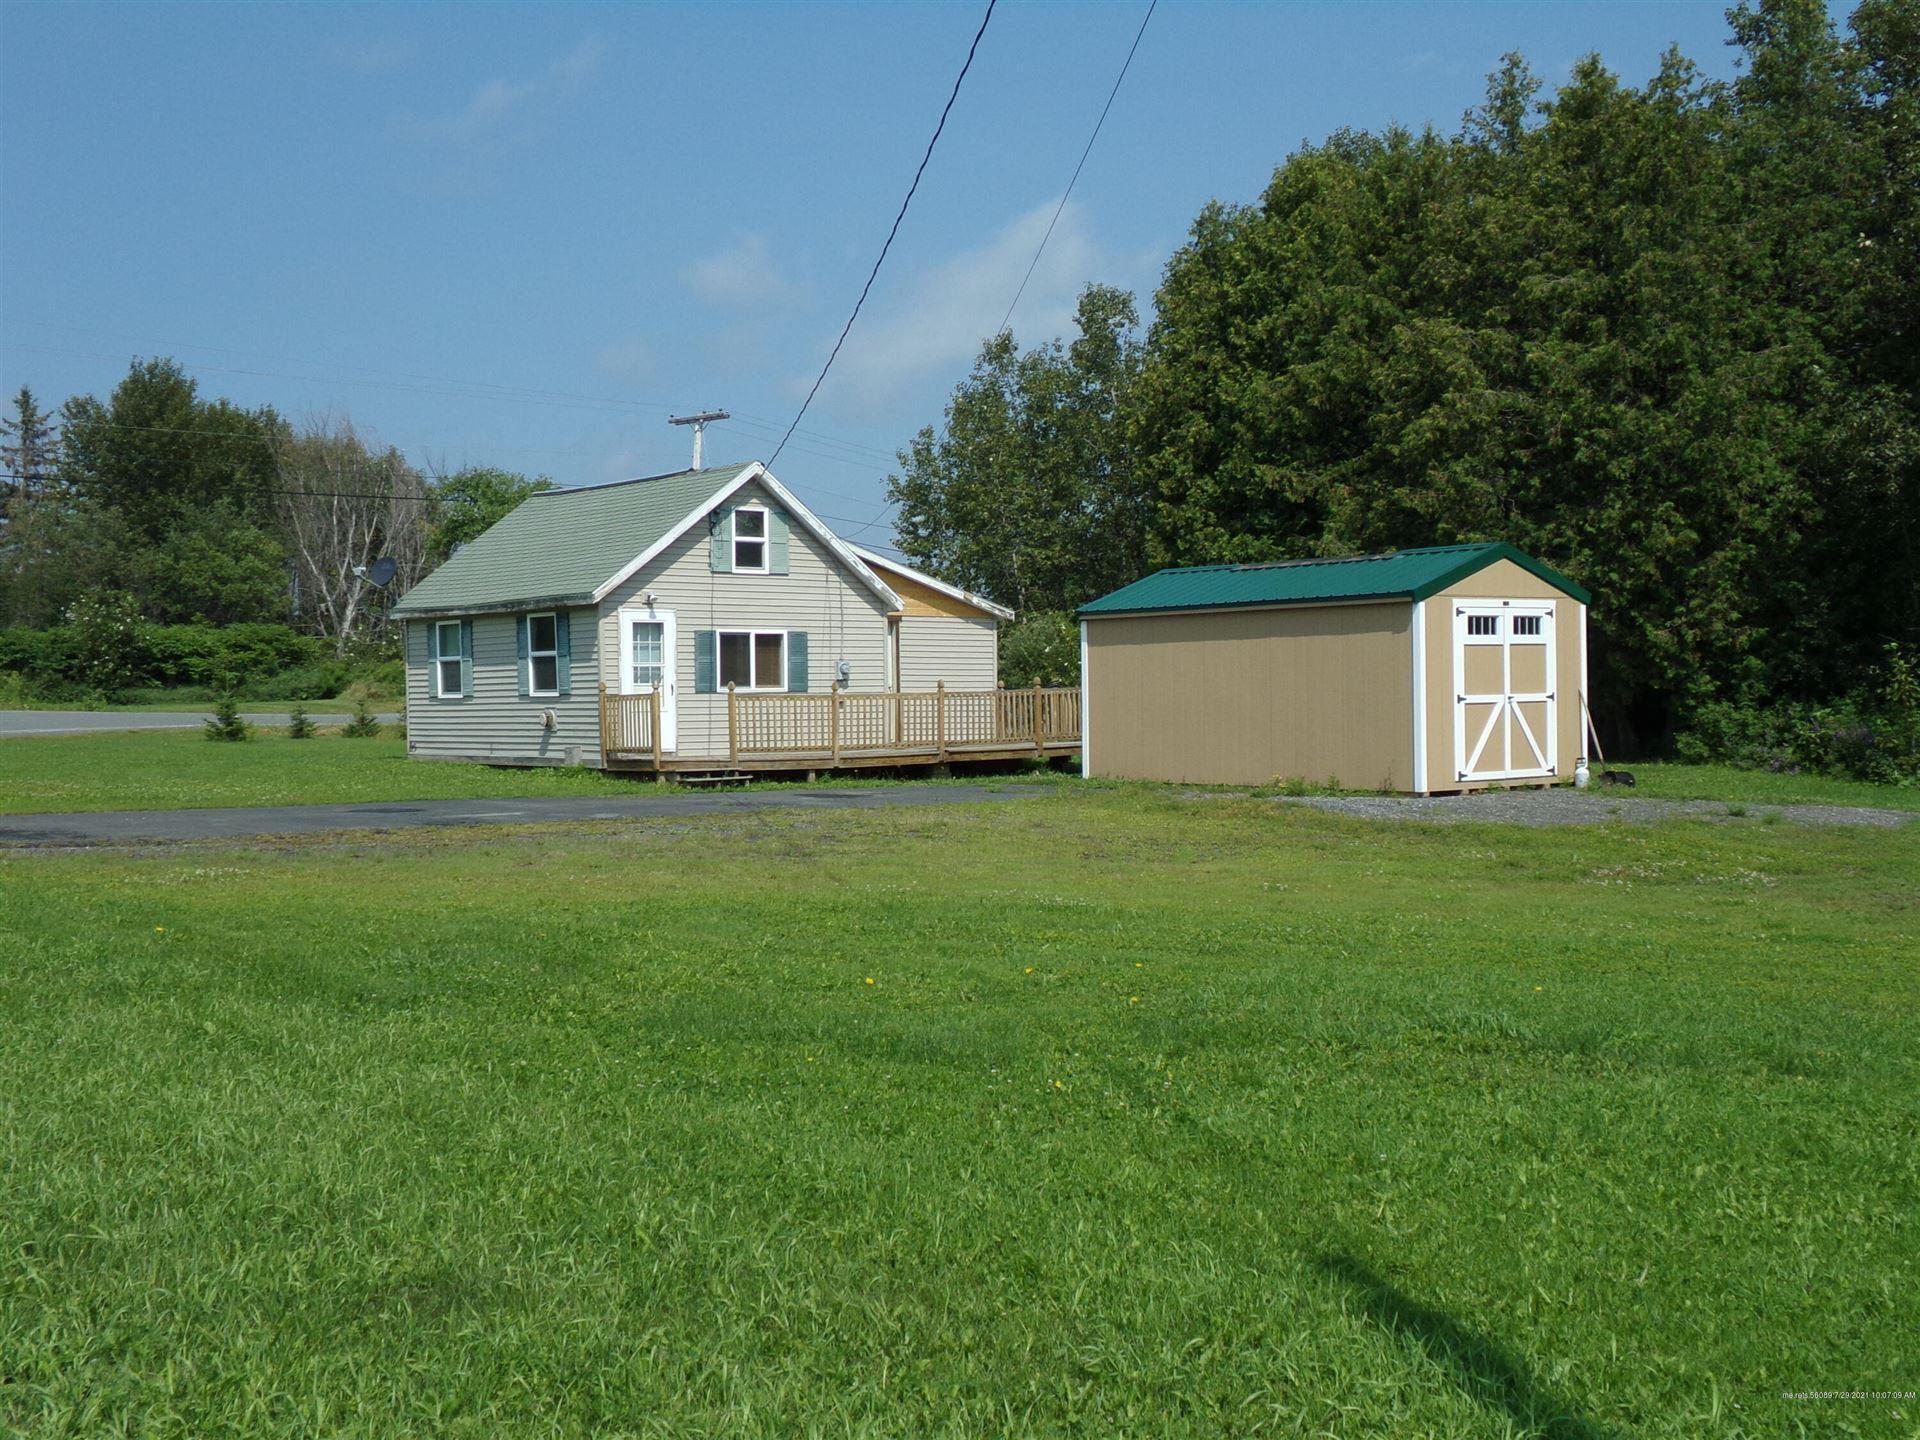 Photo of 1841 State Road, Mapleton, ME 04757 (MLS # 1502491)